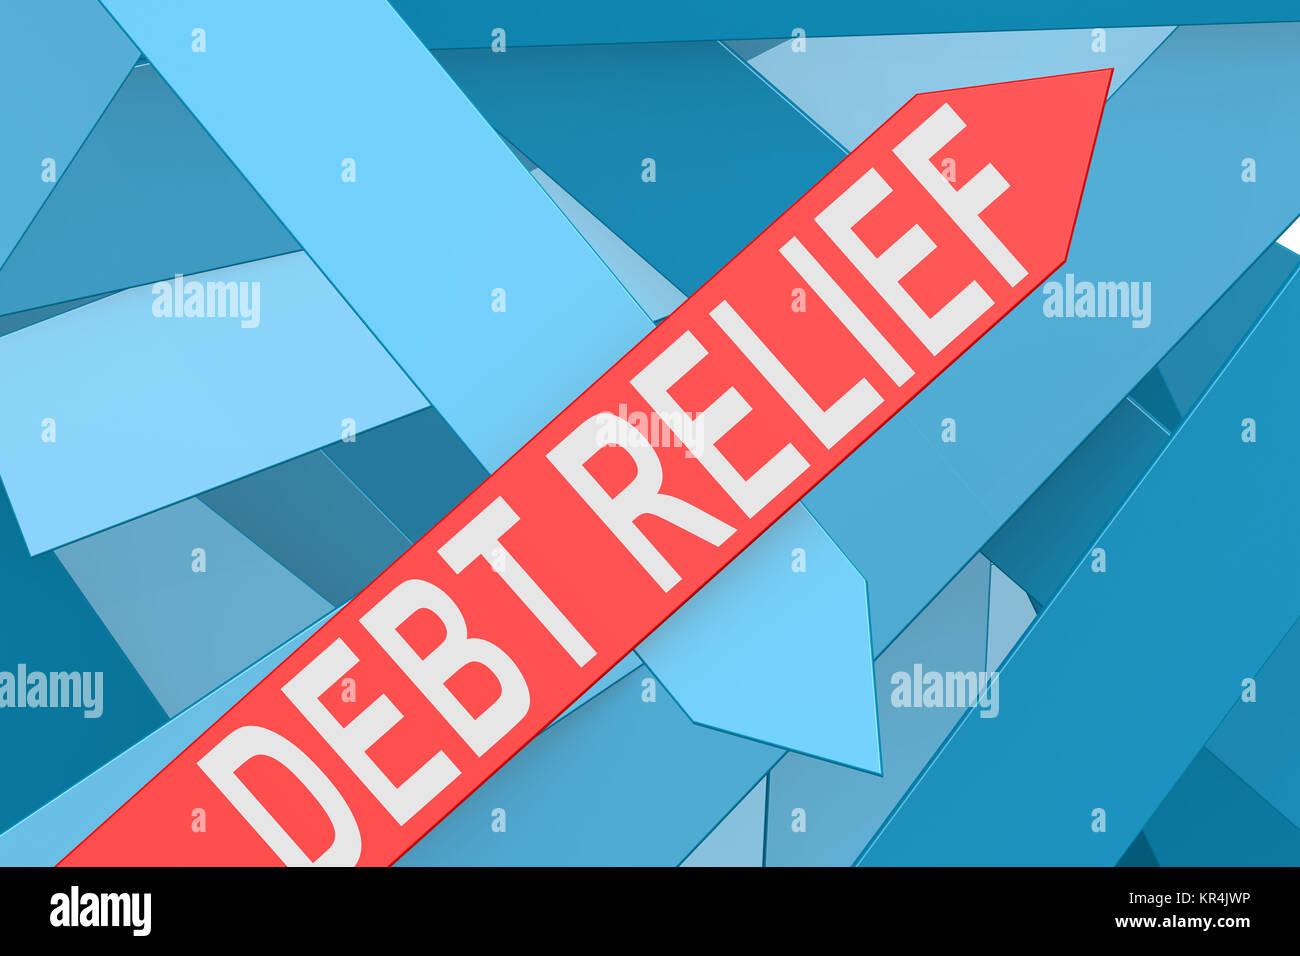 Debt relief arrow pointing upward - Stock Image